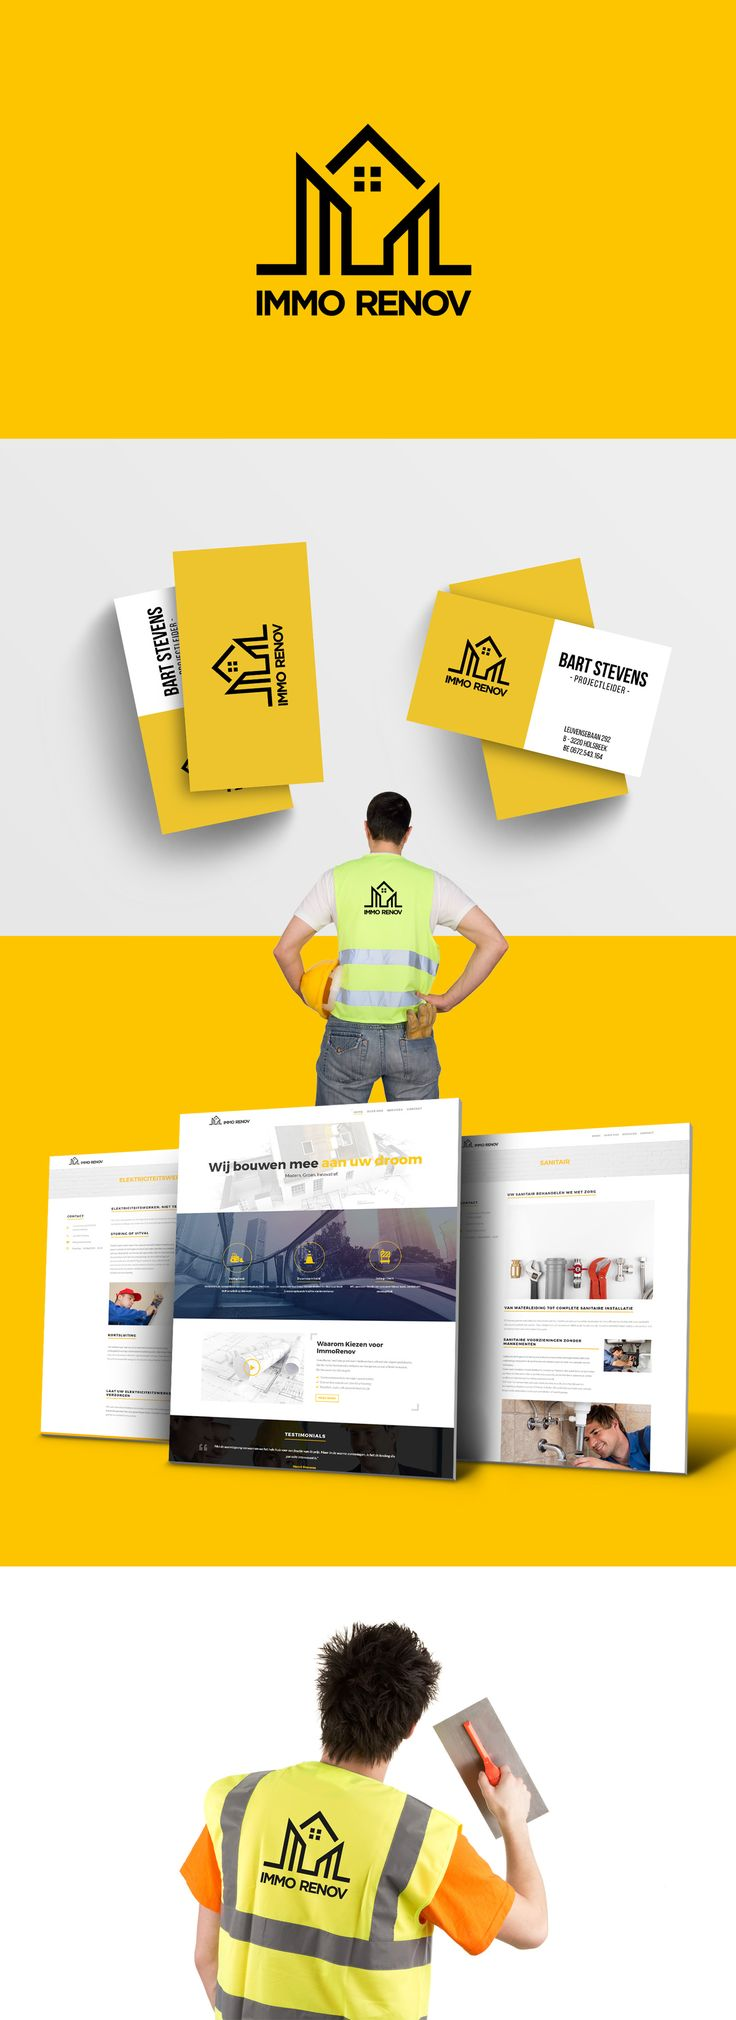 #branding #construction #works #businesscard #website